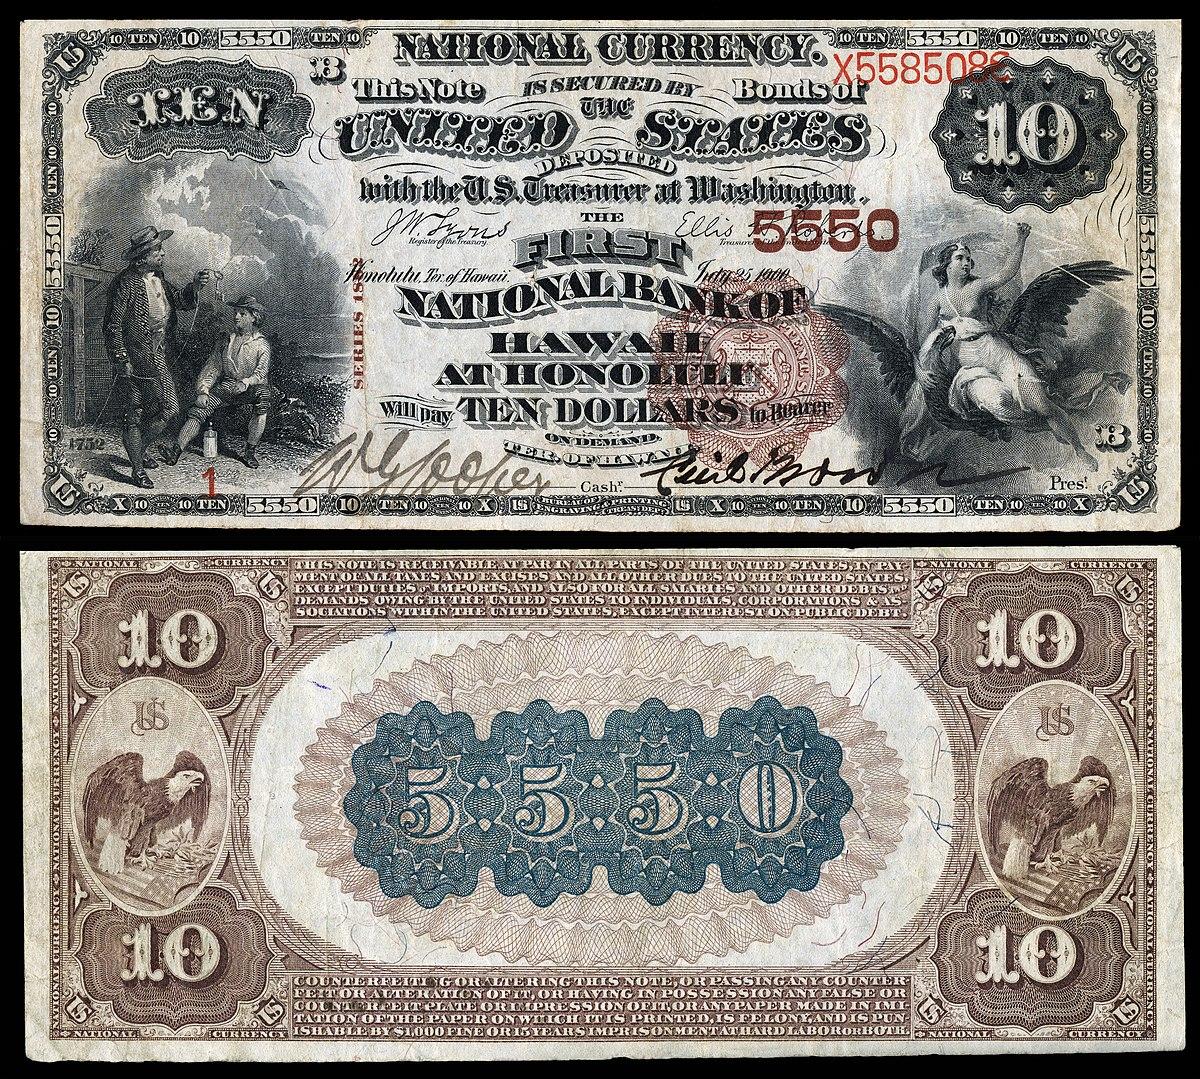 Supersonic cash advance picture 9